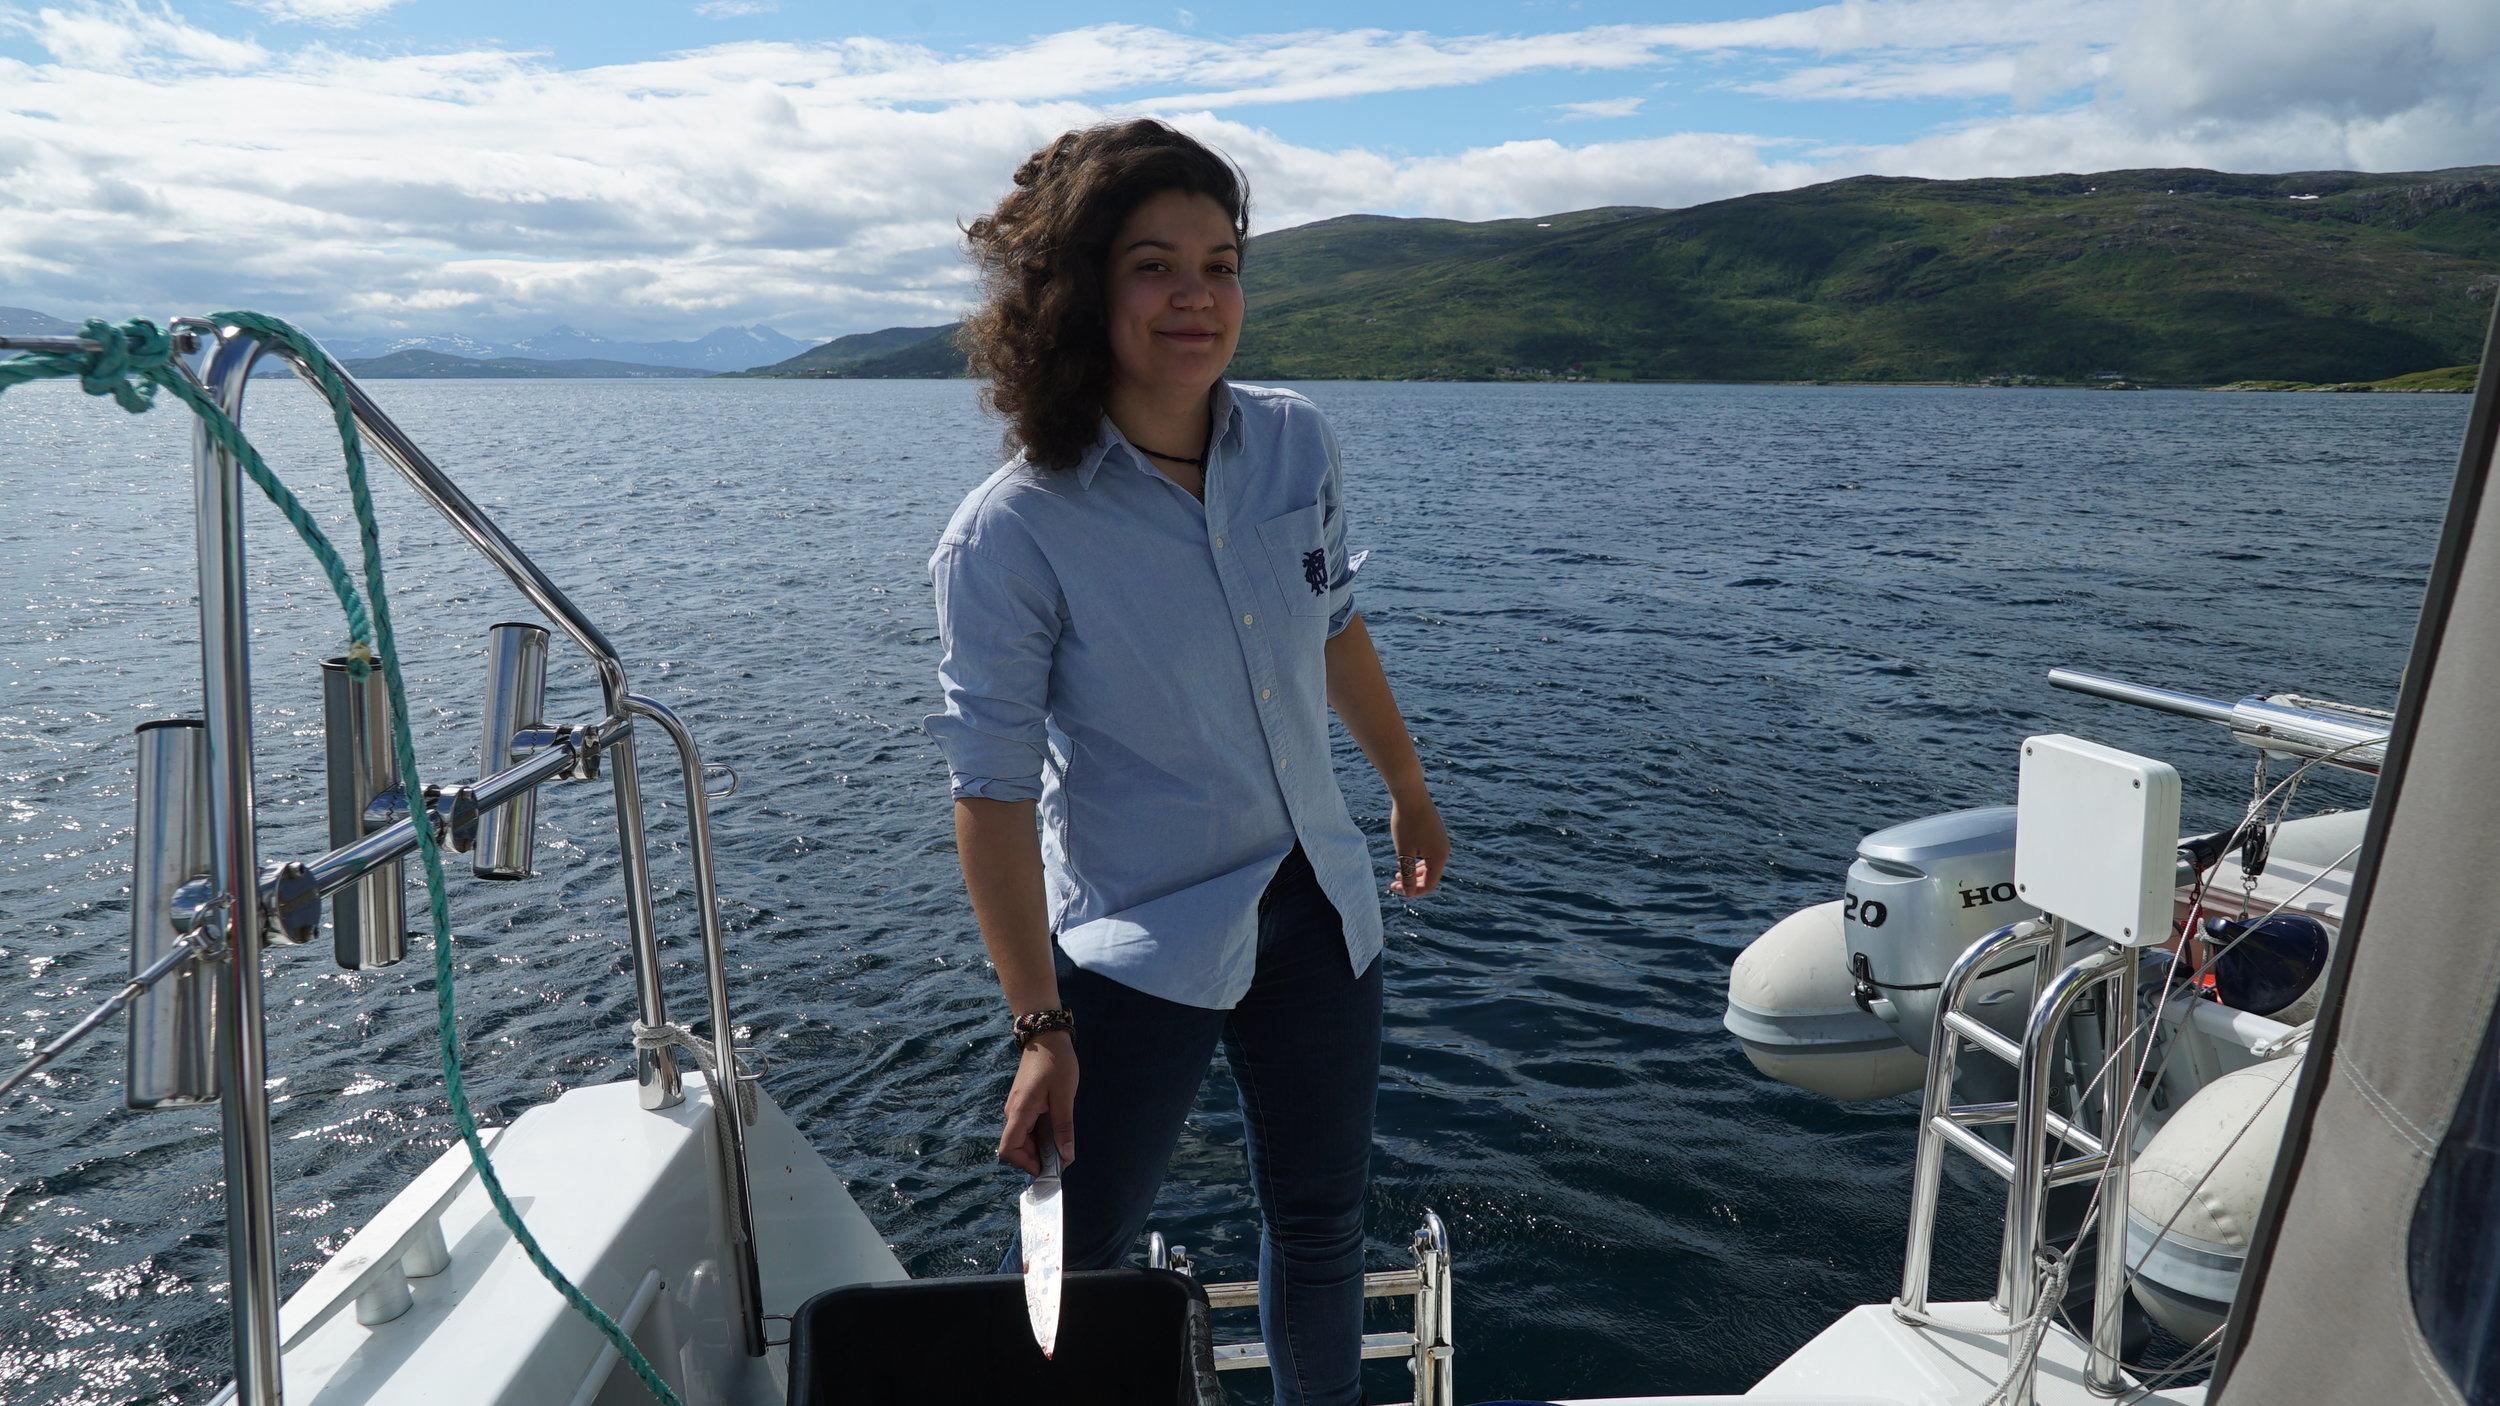 #Fjordcruise #Fishing #Tromsø